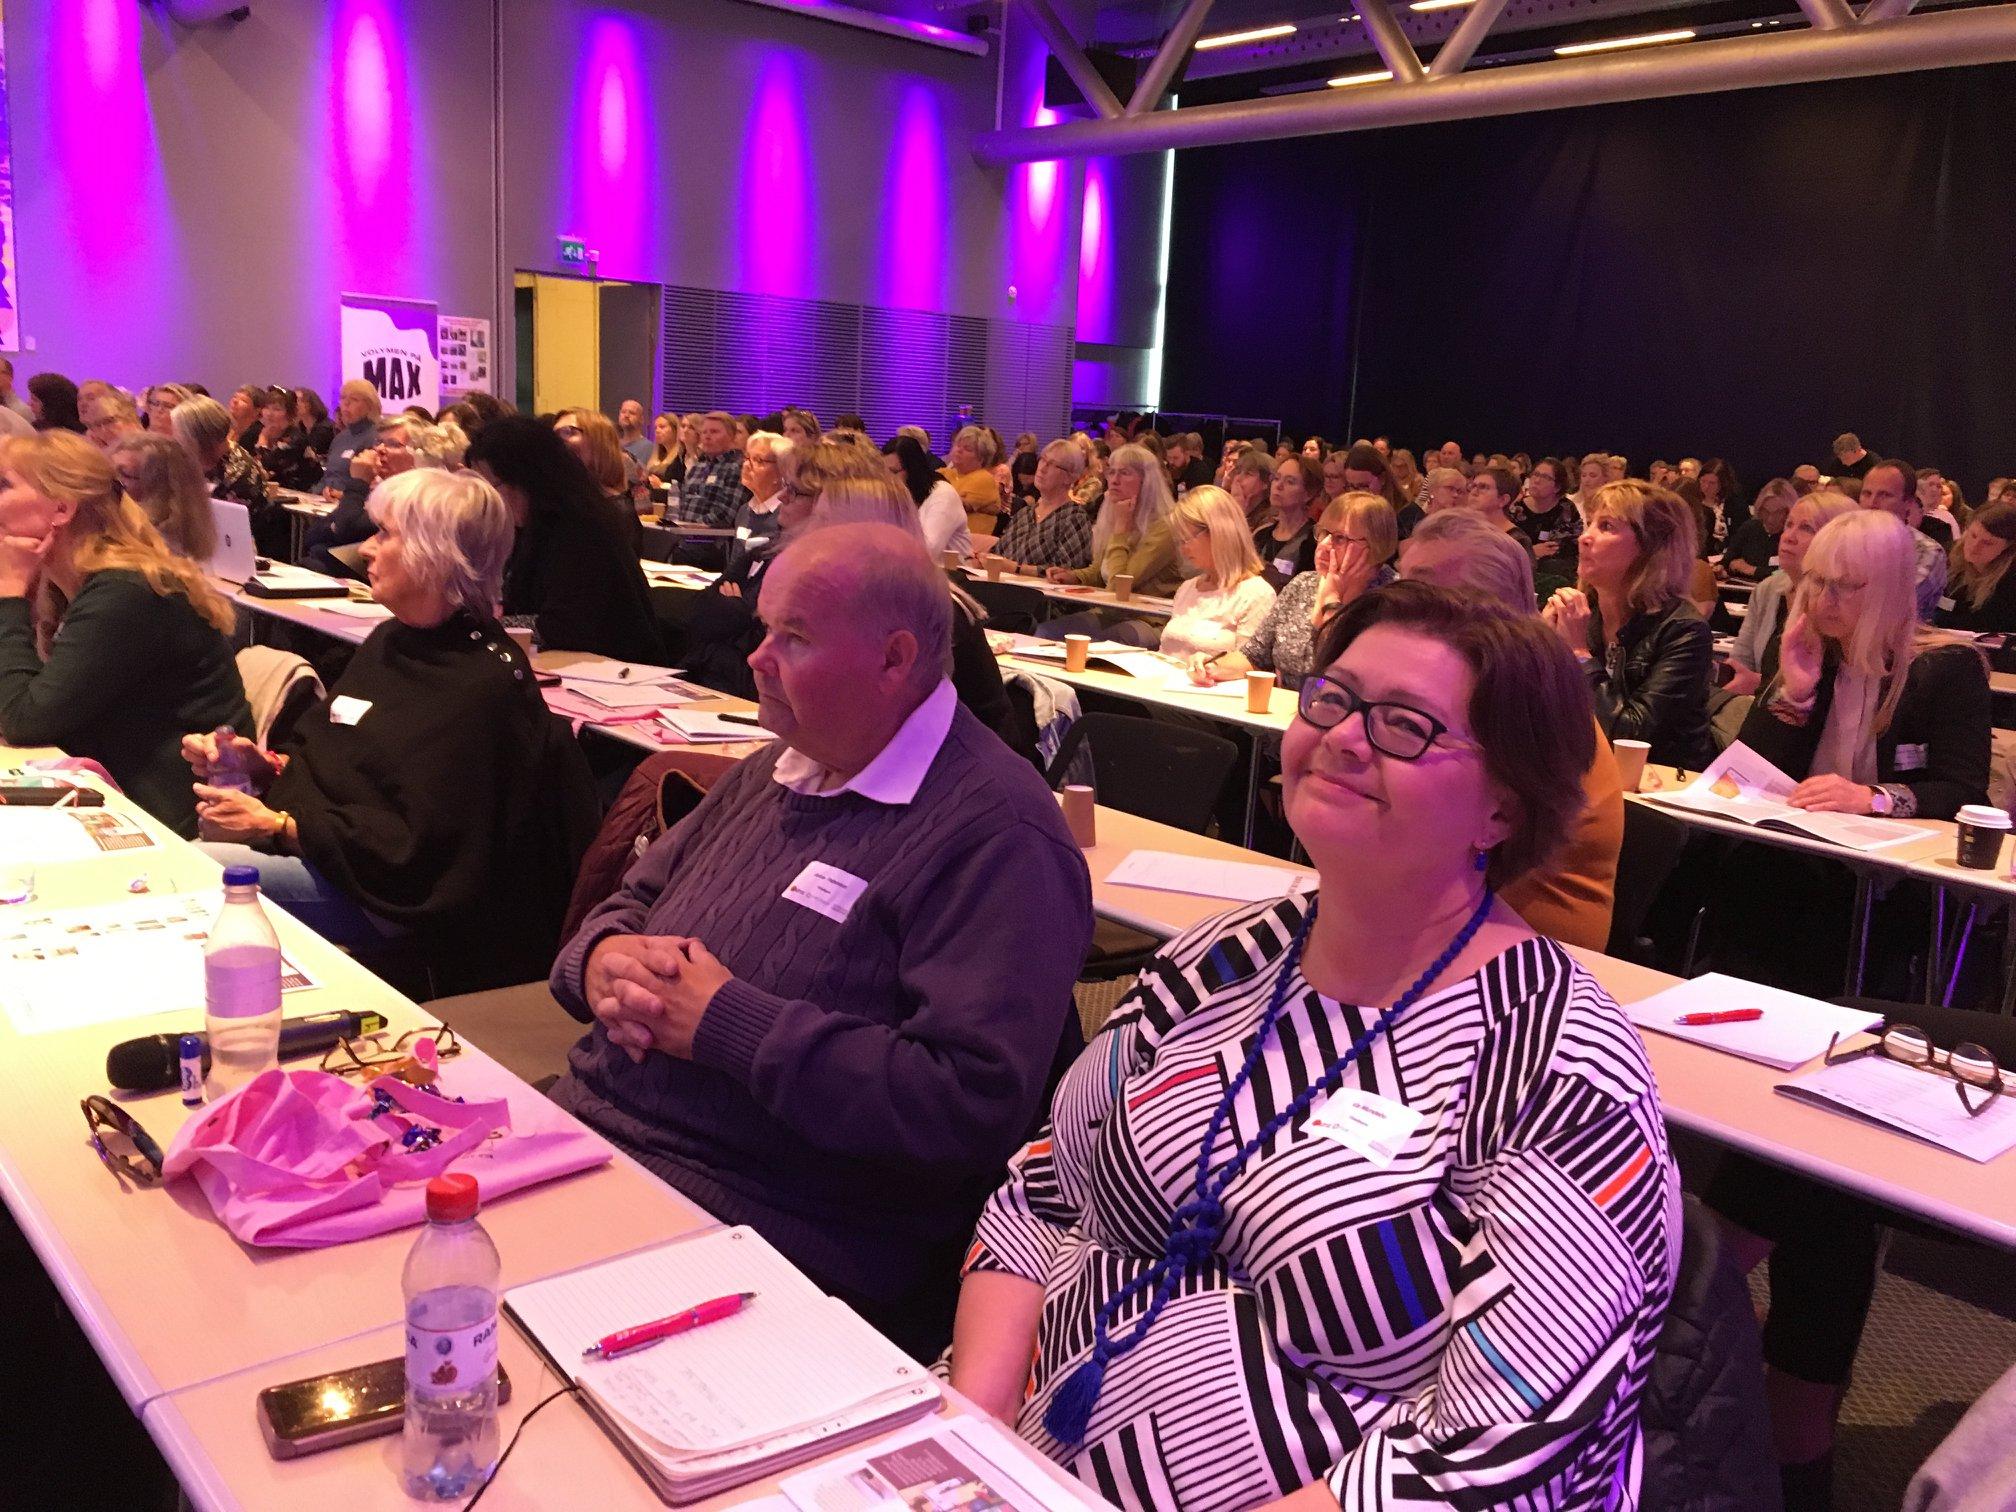 Intradagarna 2019: Janne Pettersson och Kia Mundebo